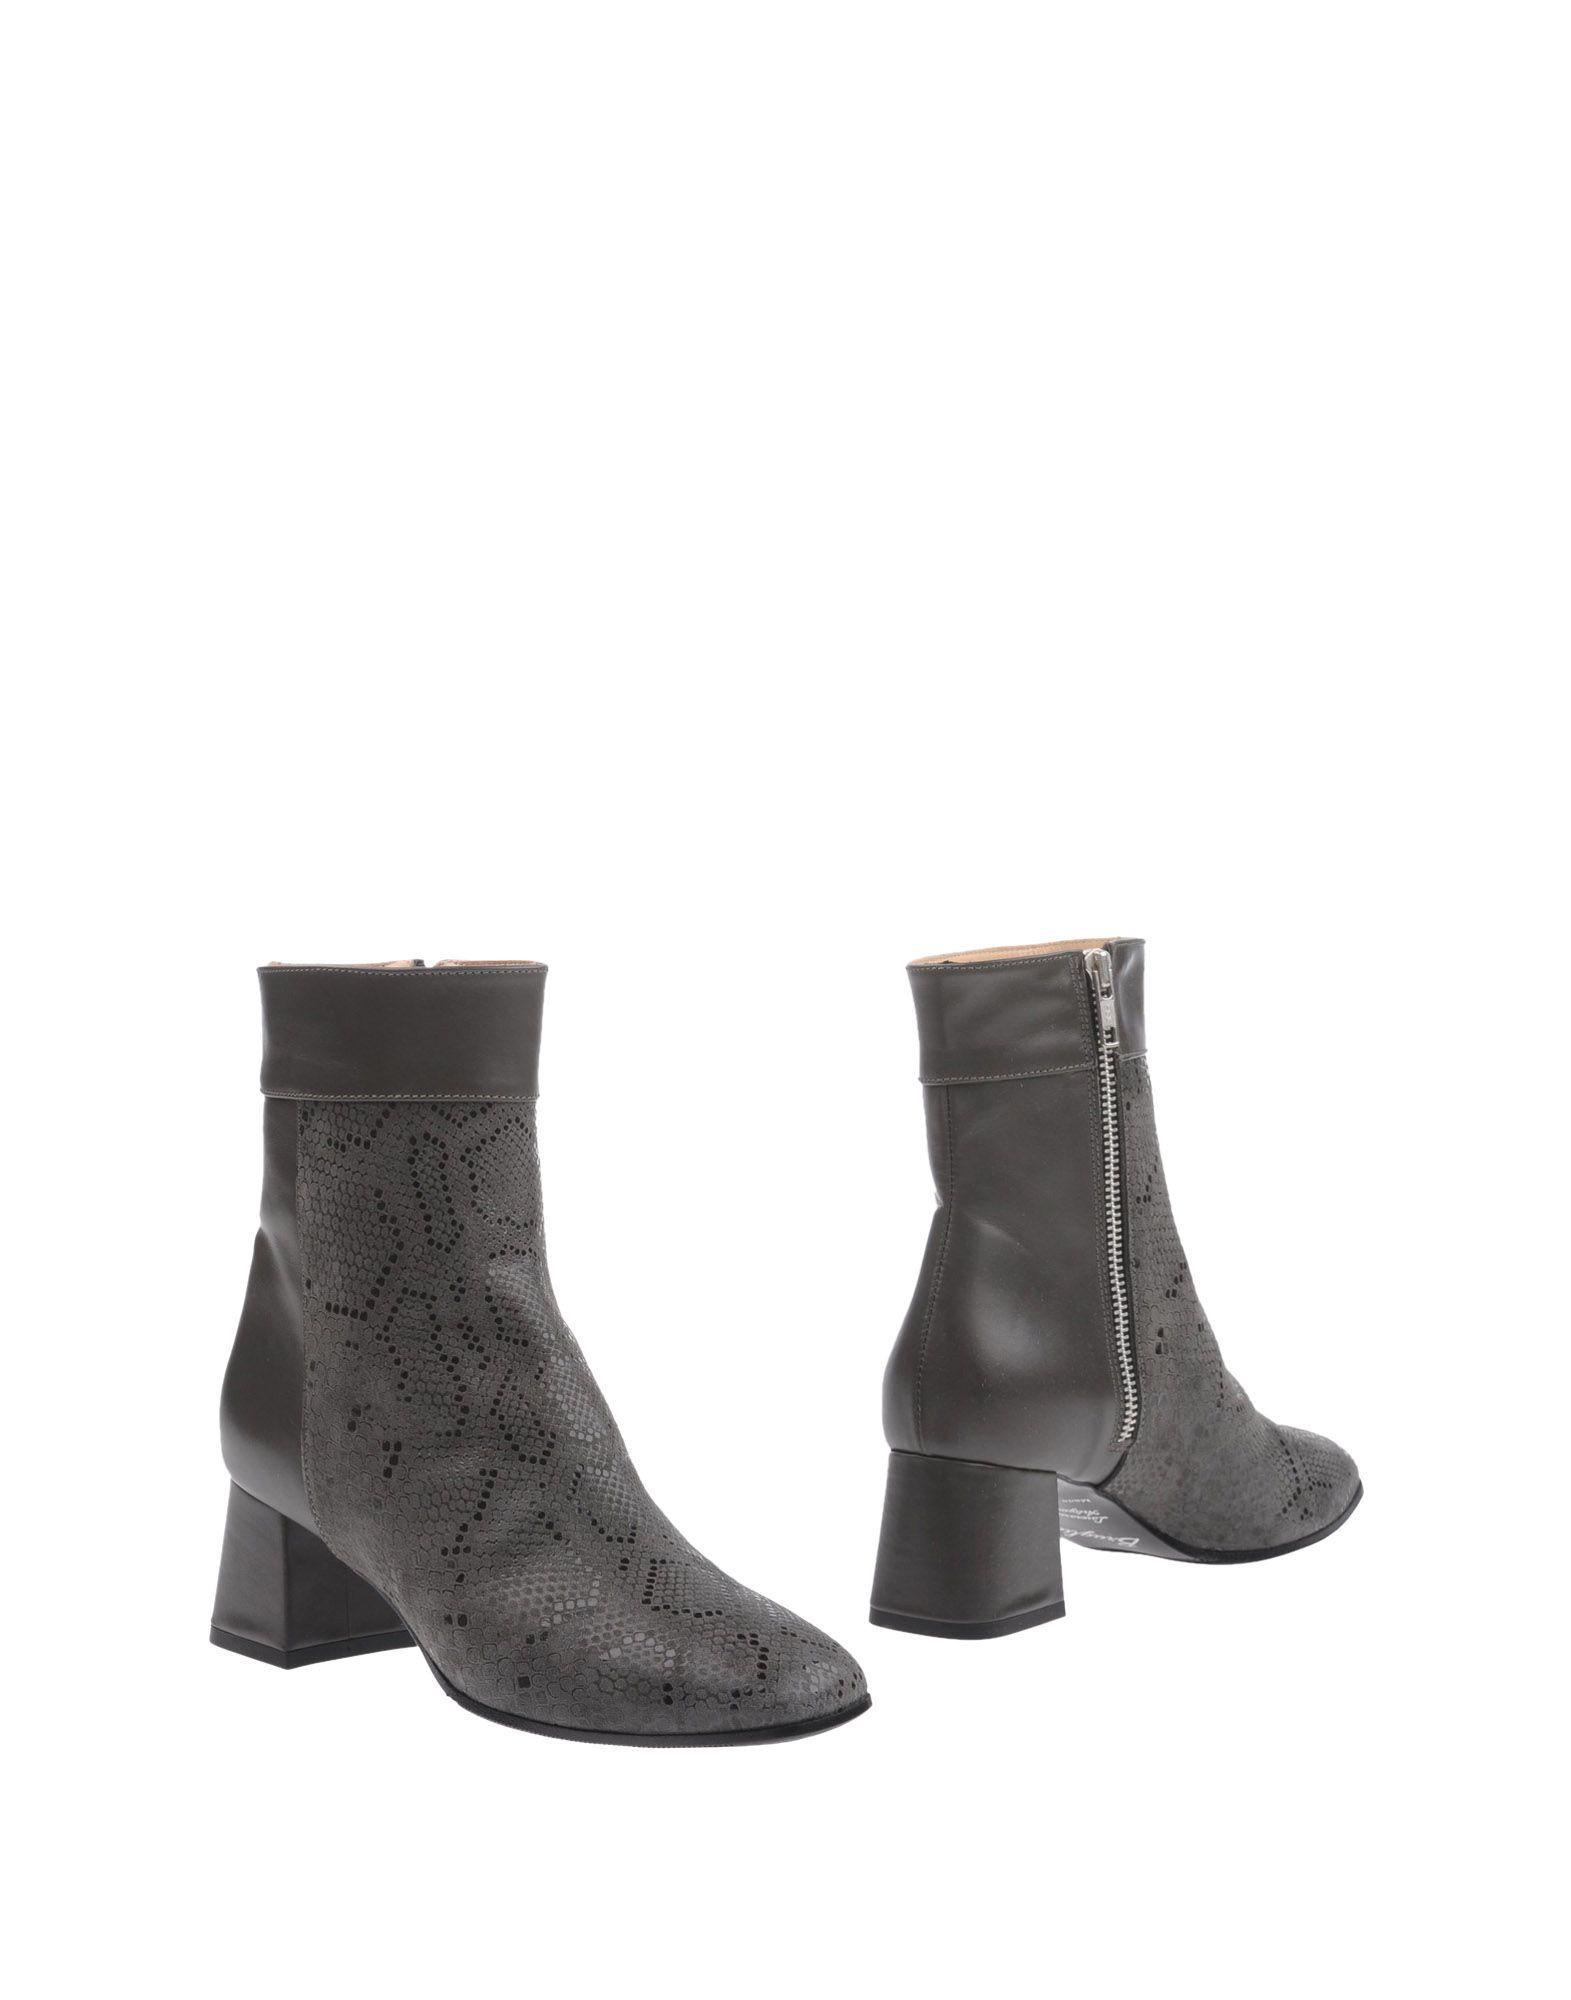 Stilvolle billige Schuhe F.Lli 11219031FJ Bruglia Stiefelette Damen  11219031FJ F.Lli 7a2d9e